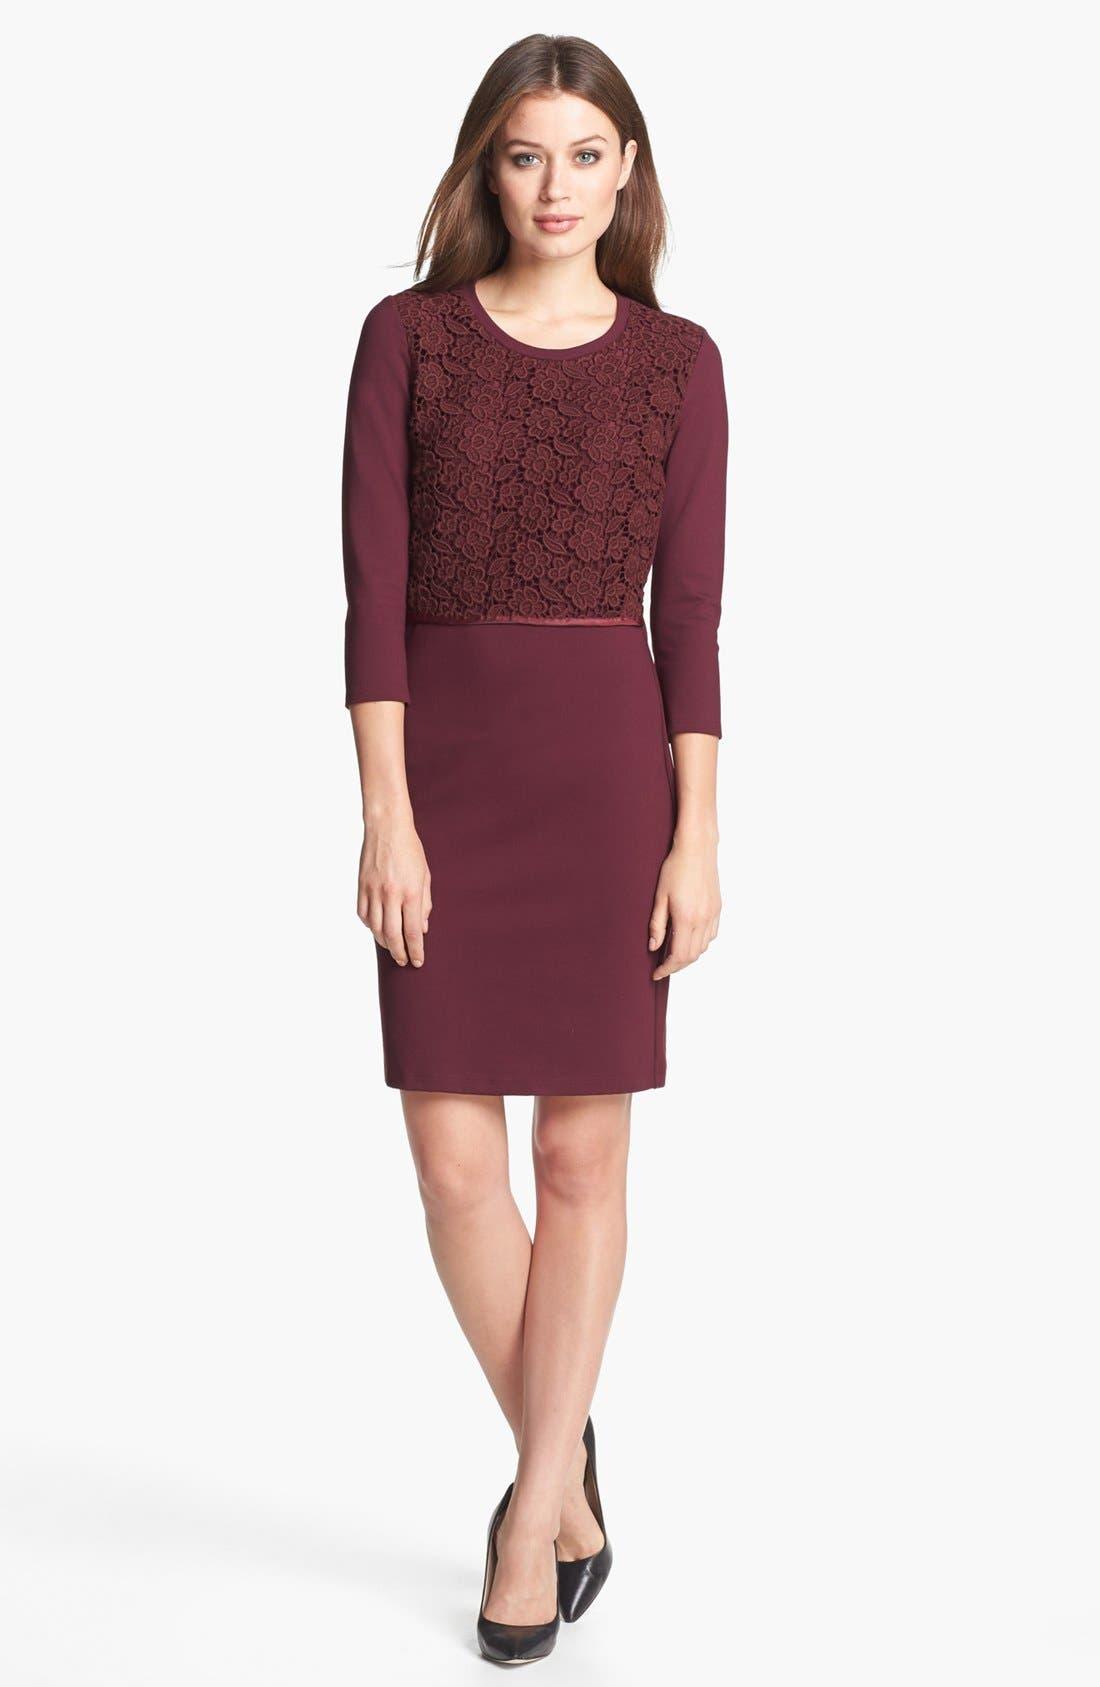 Alternate Image 1 Selected - Weekend Max Mara 'Provino' Jersey Dress